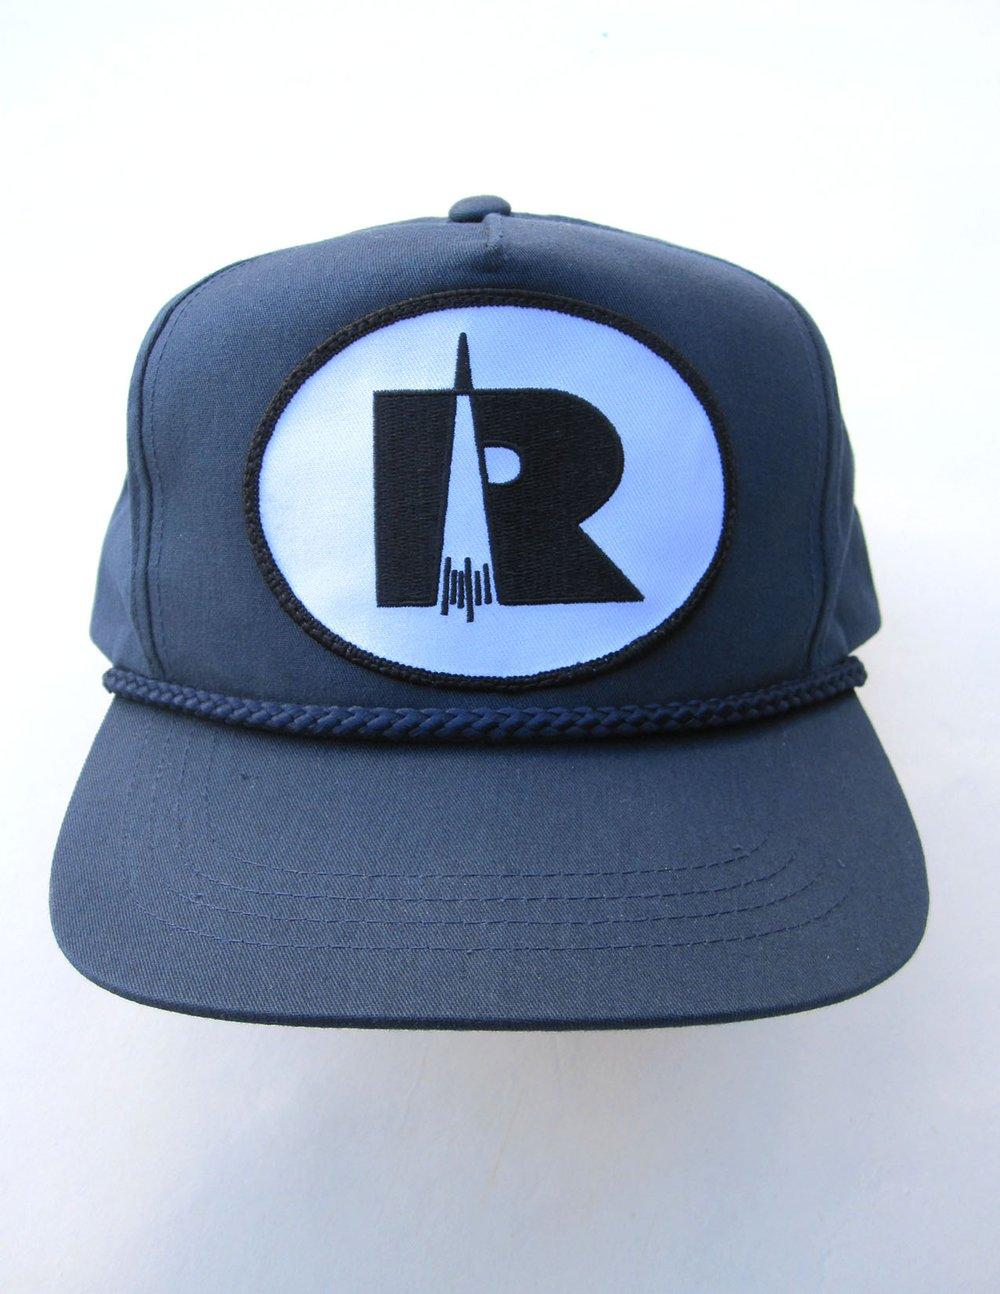 Image of Rocketdyne cap